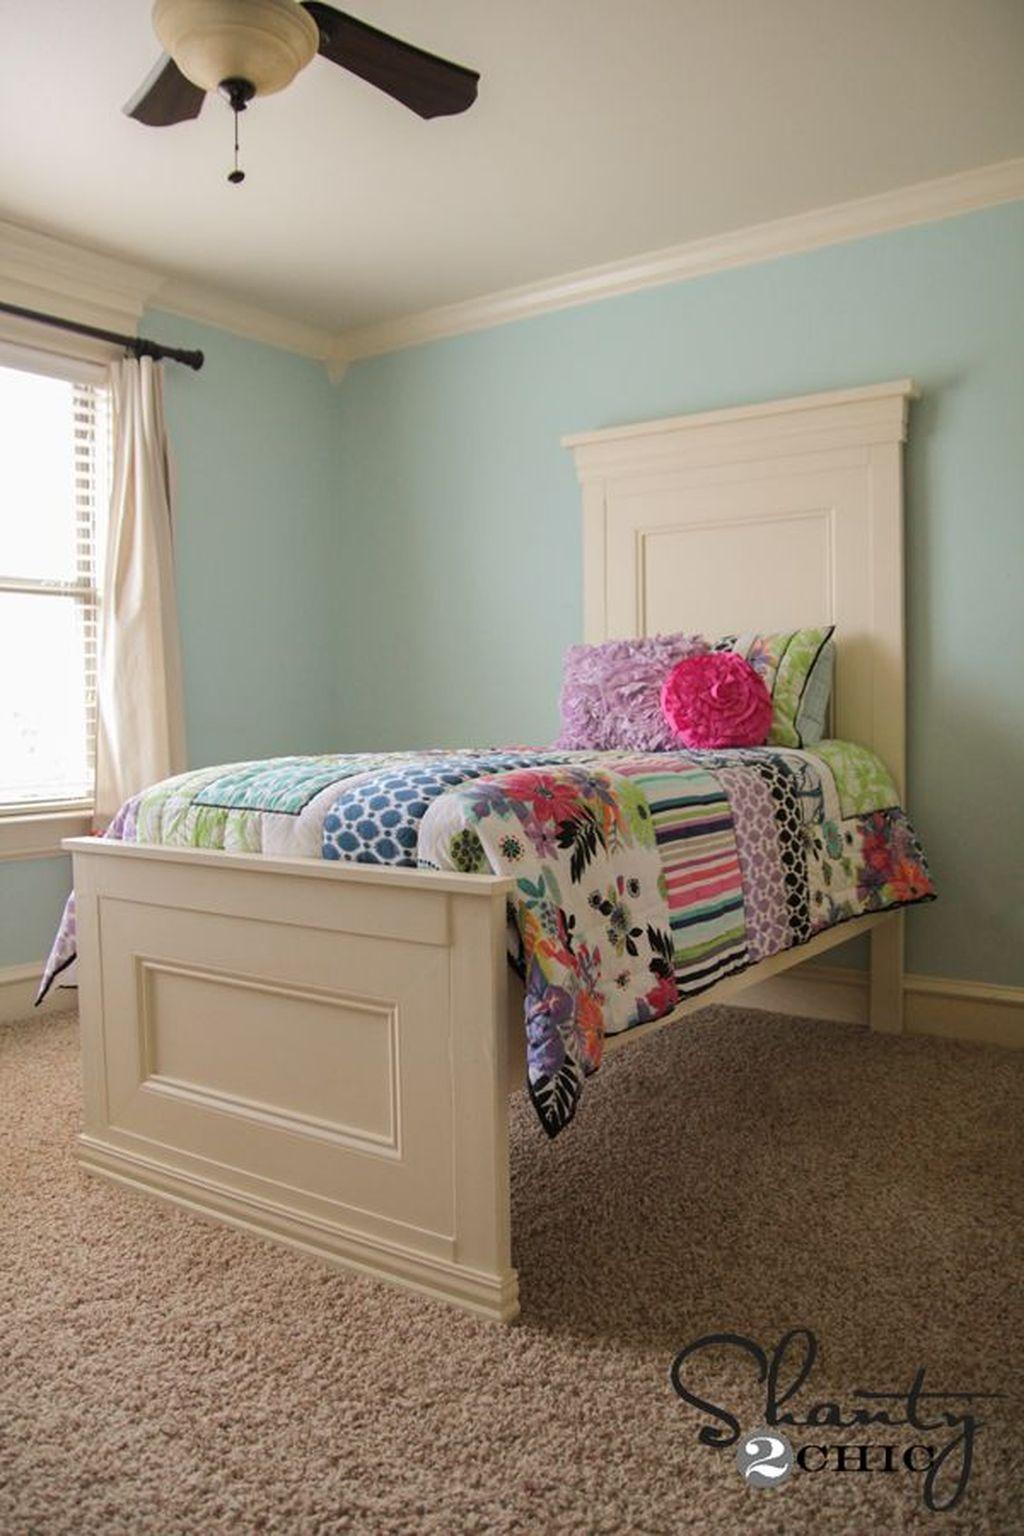 45 Amazing Diy Headboard Ideas Projects Diy twin bed